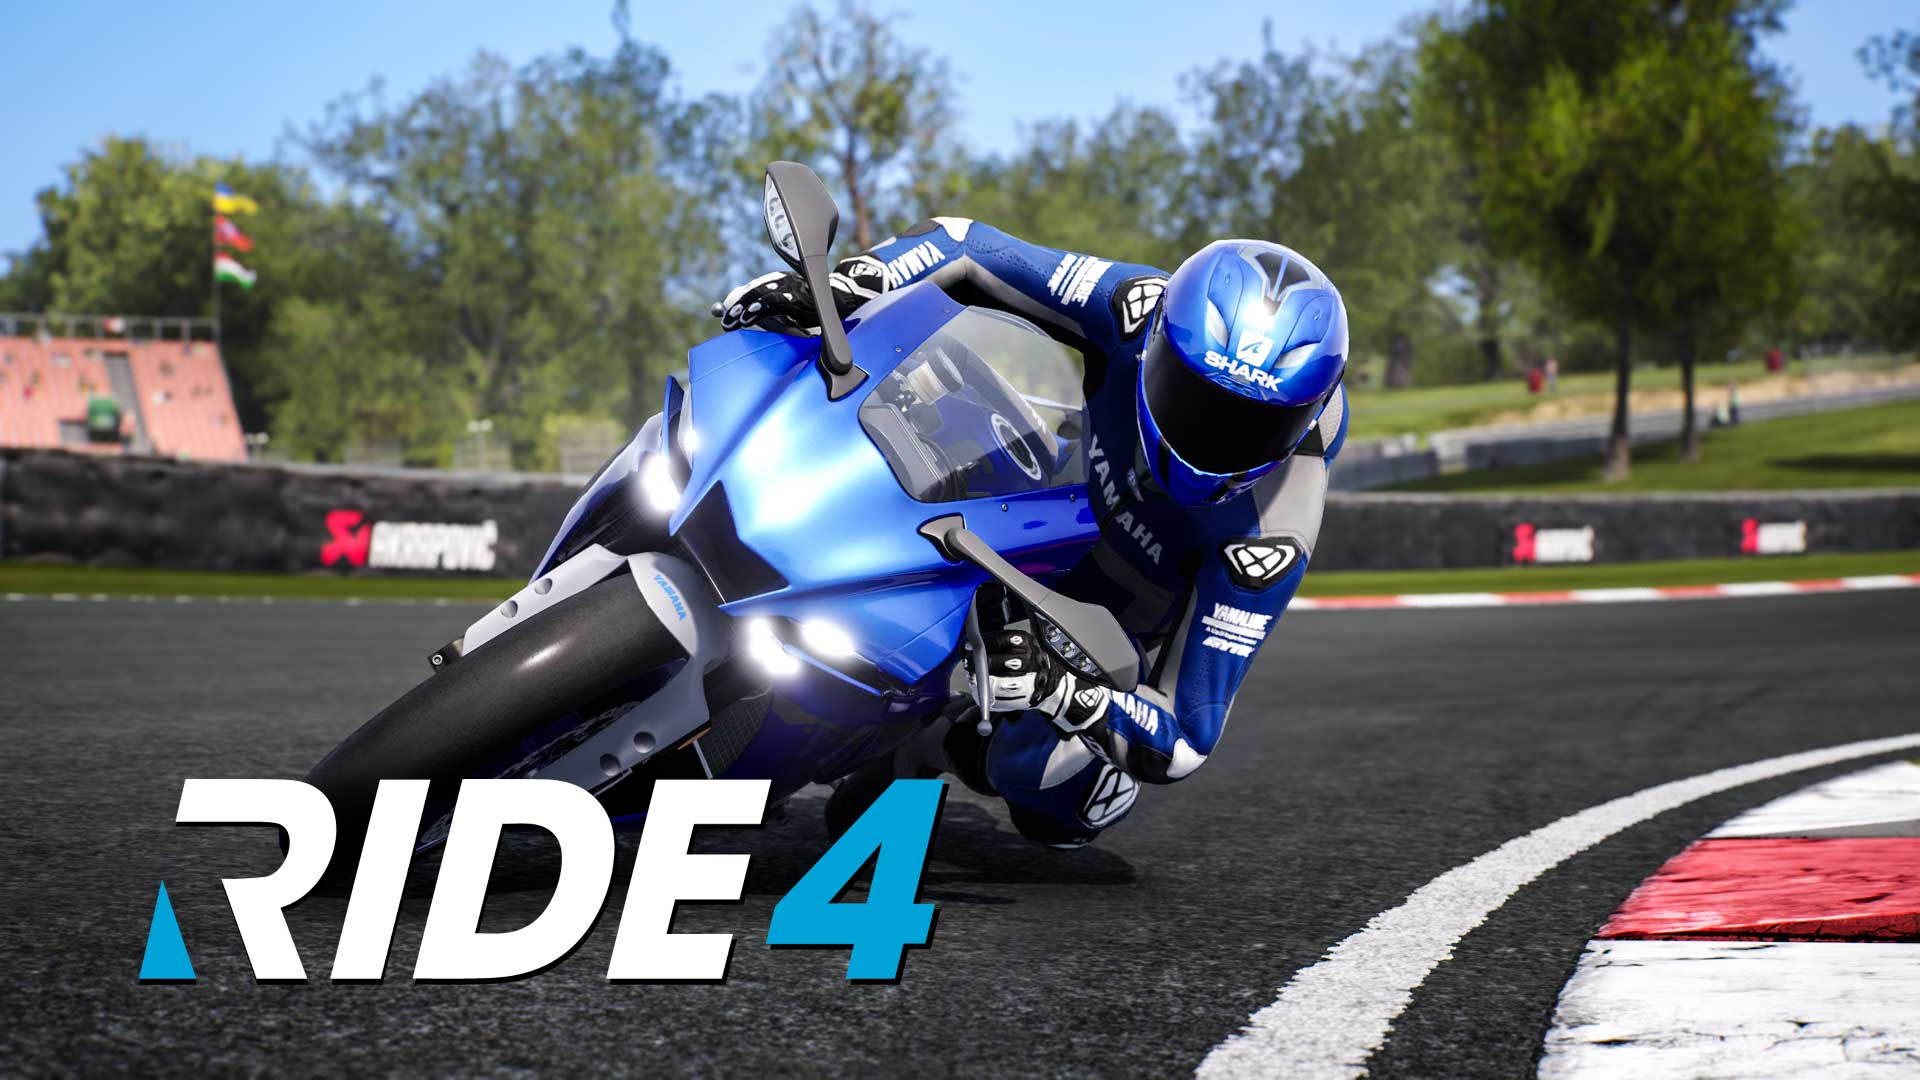 ride 4 release cover